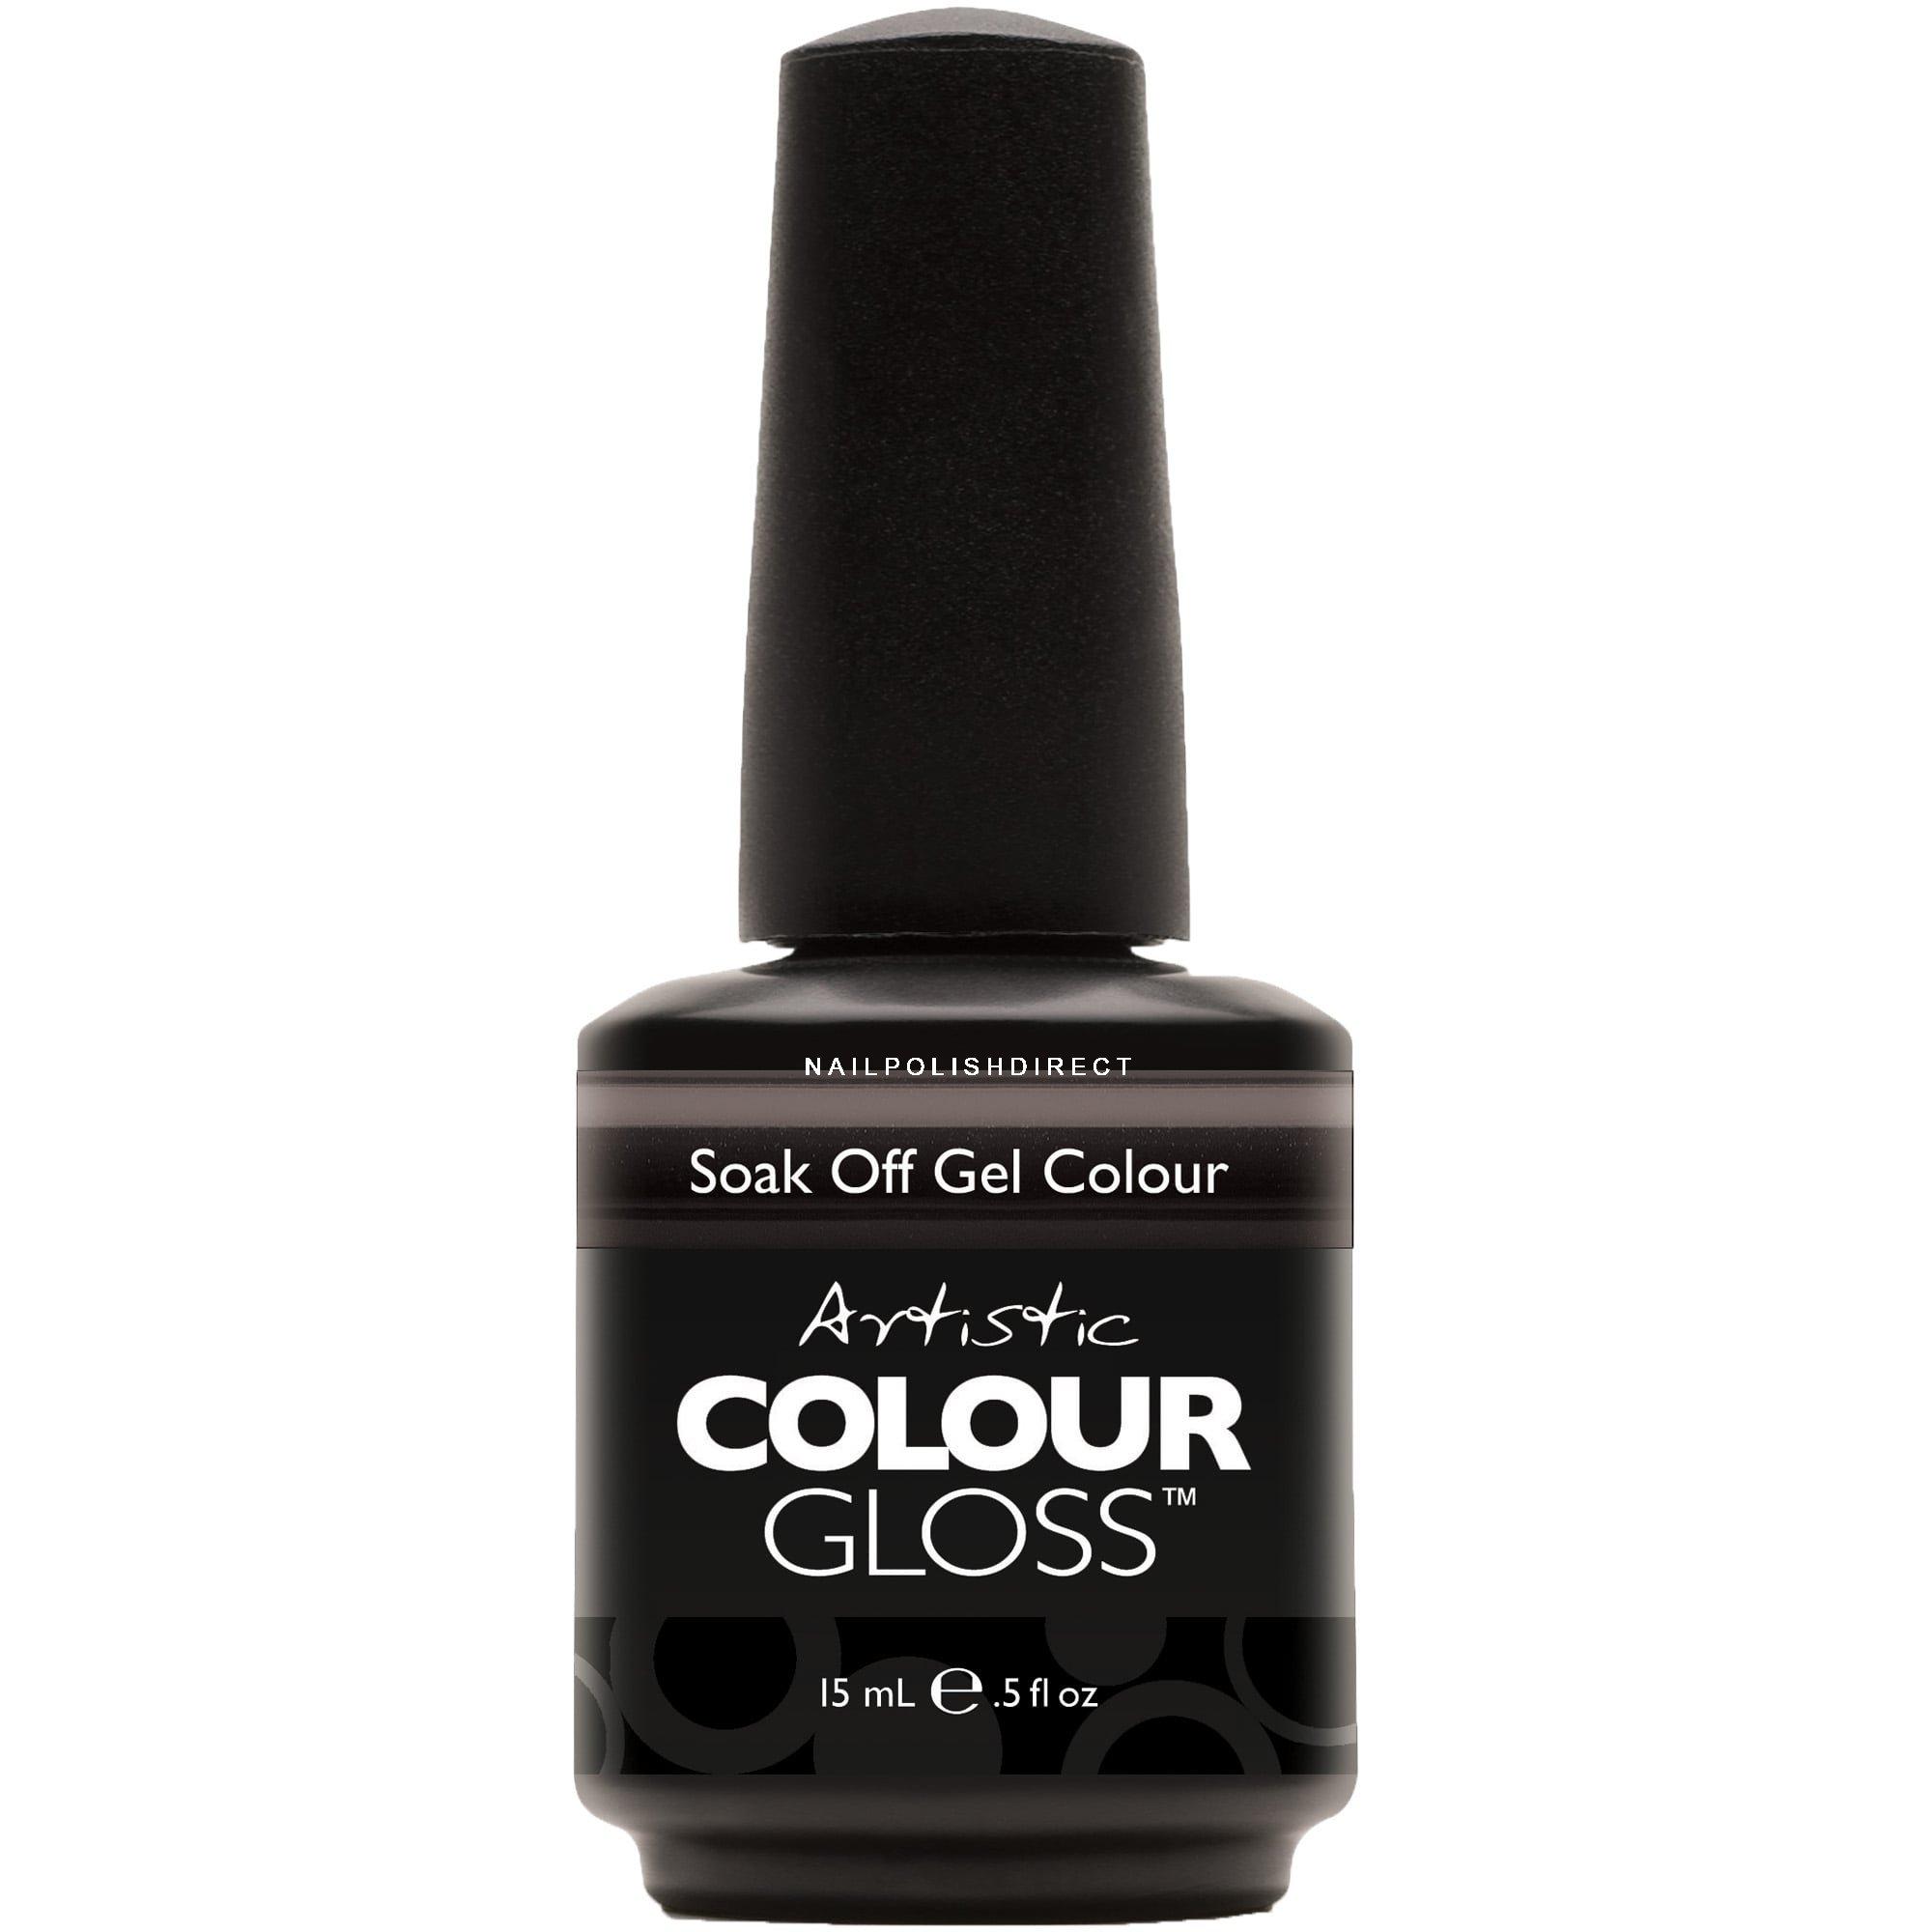 Artistic Colour Gloss Soak Off Gel Nail Polish - Nobility 15mL (03072)